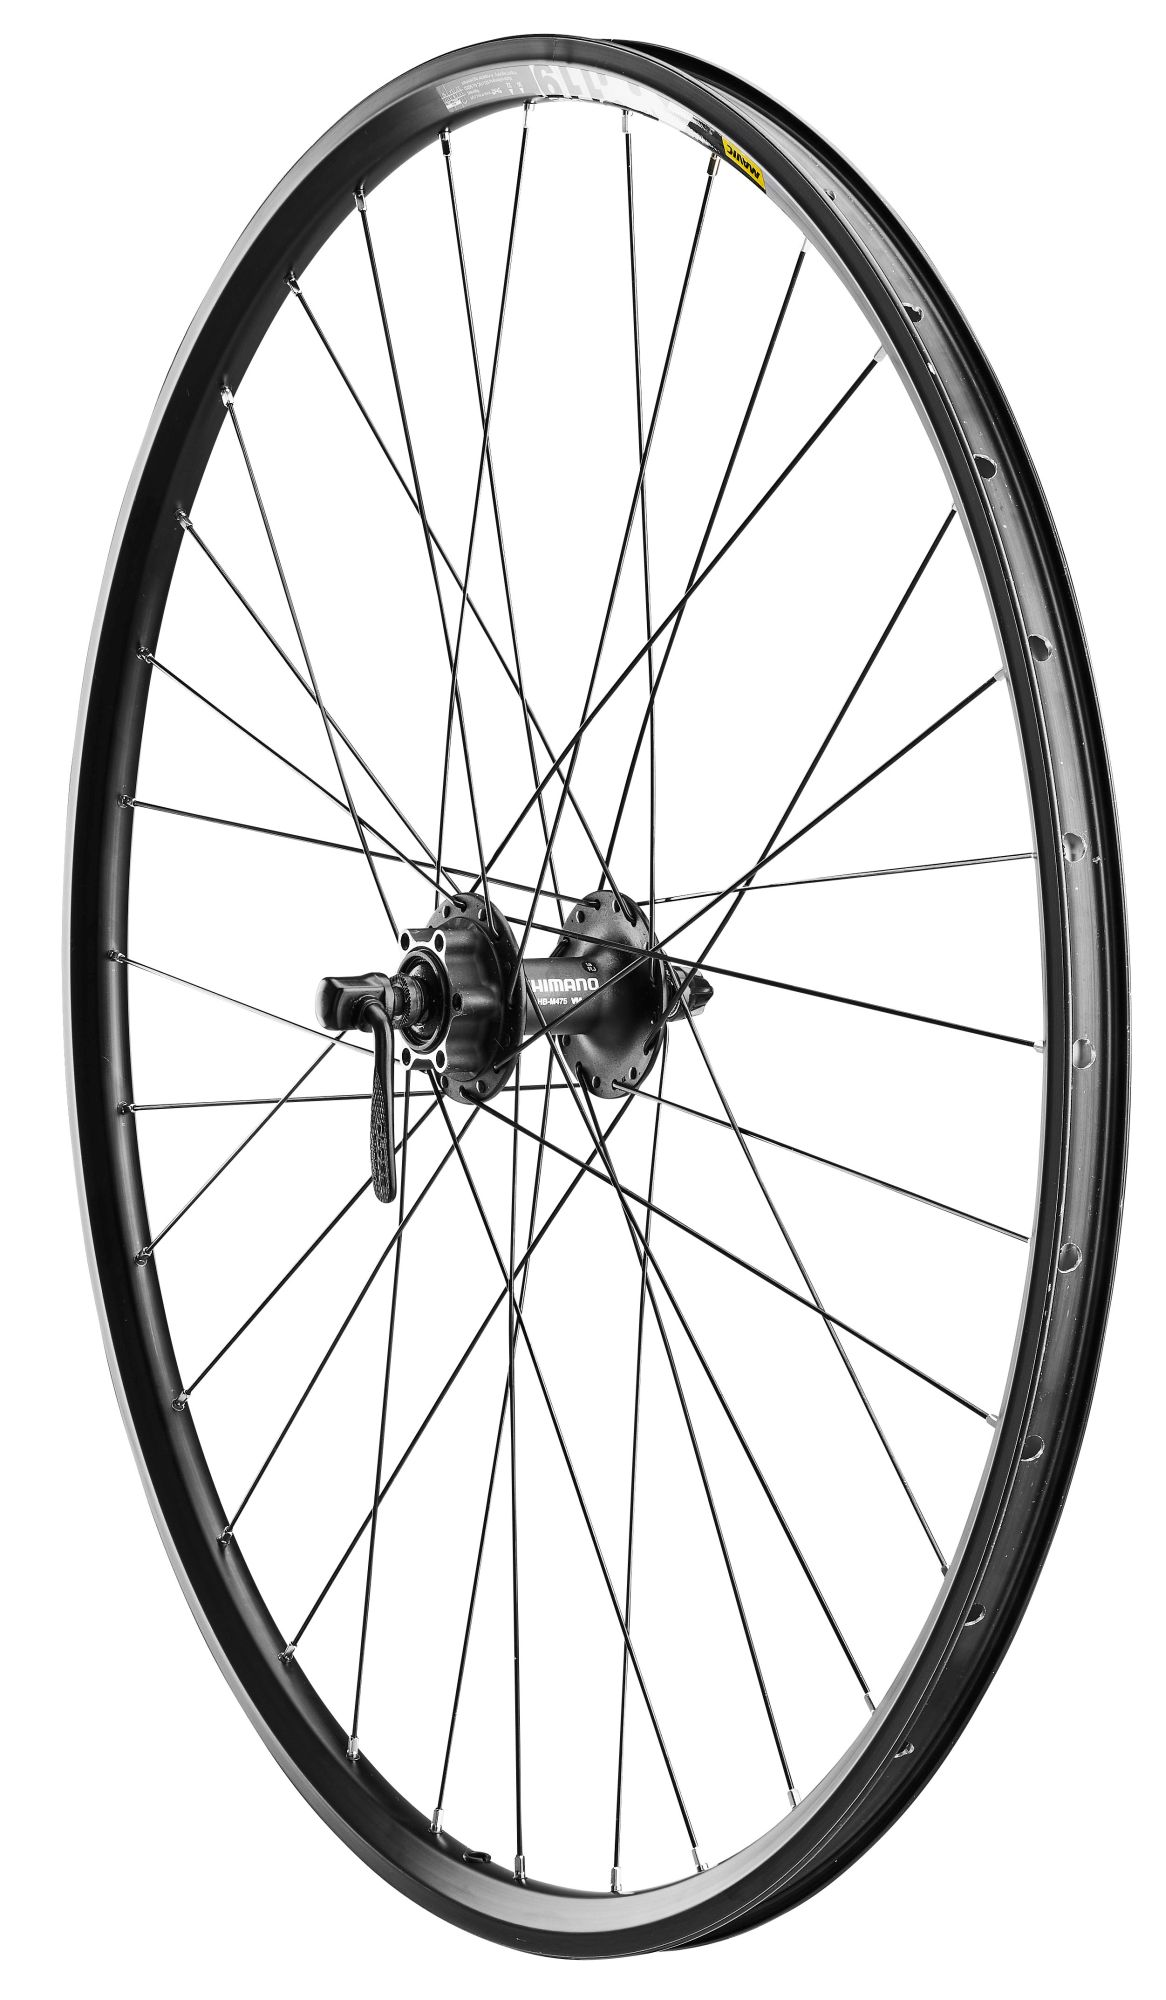 laufräder: Mavic  Vorderrad (M475 Nabe) XM 119 Disc  29 Zoll